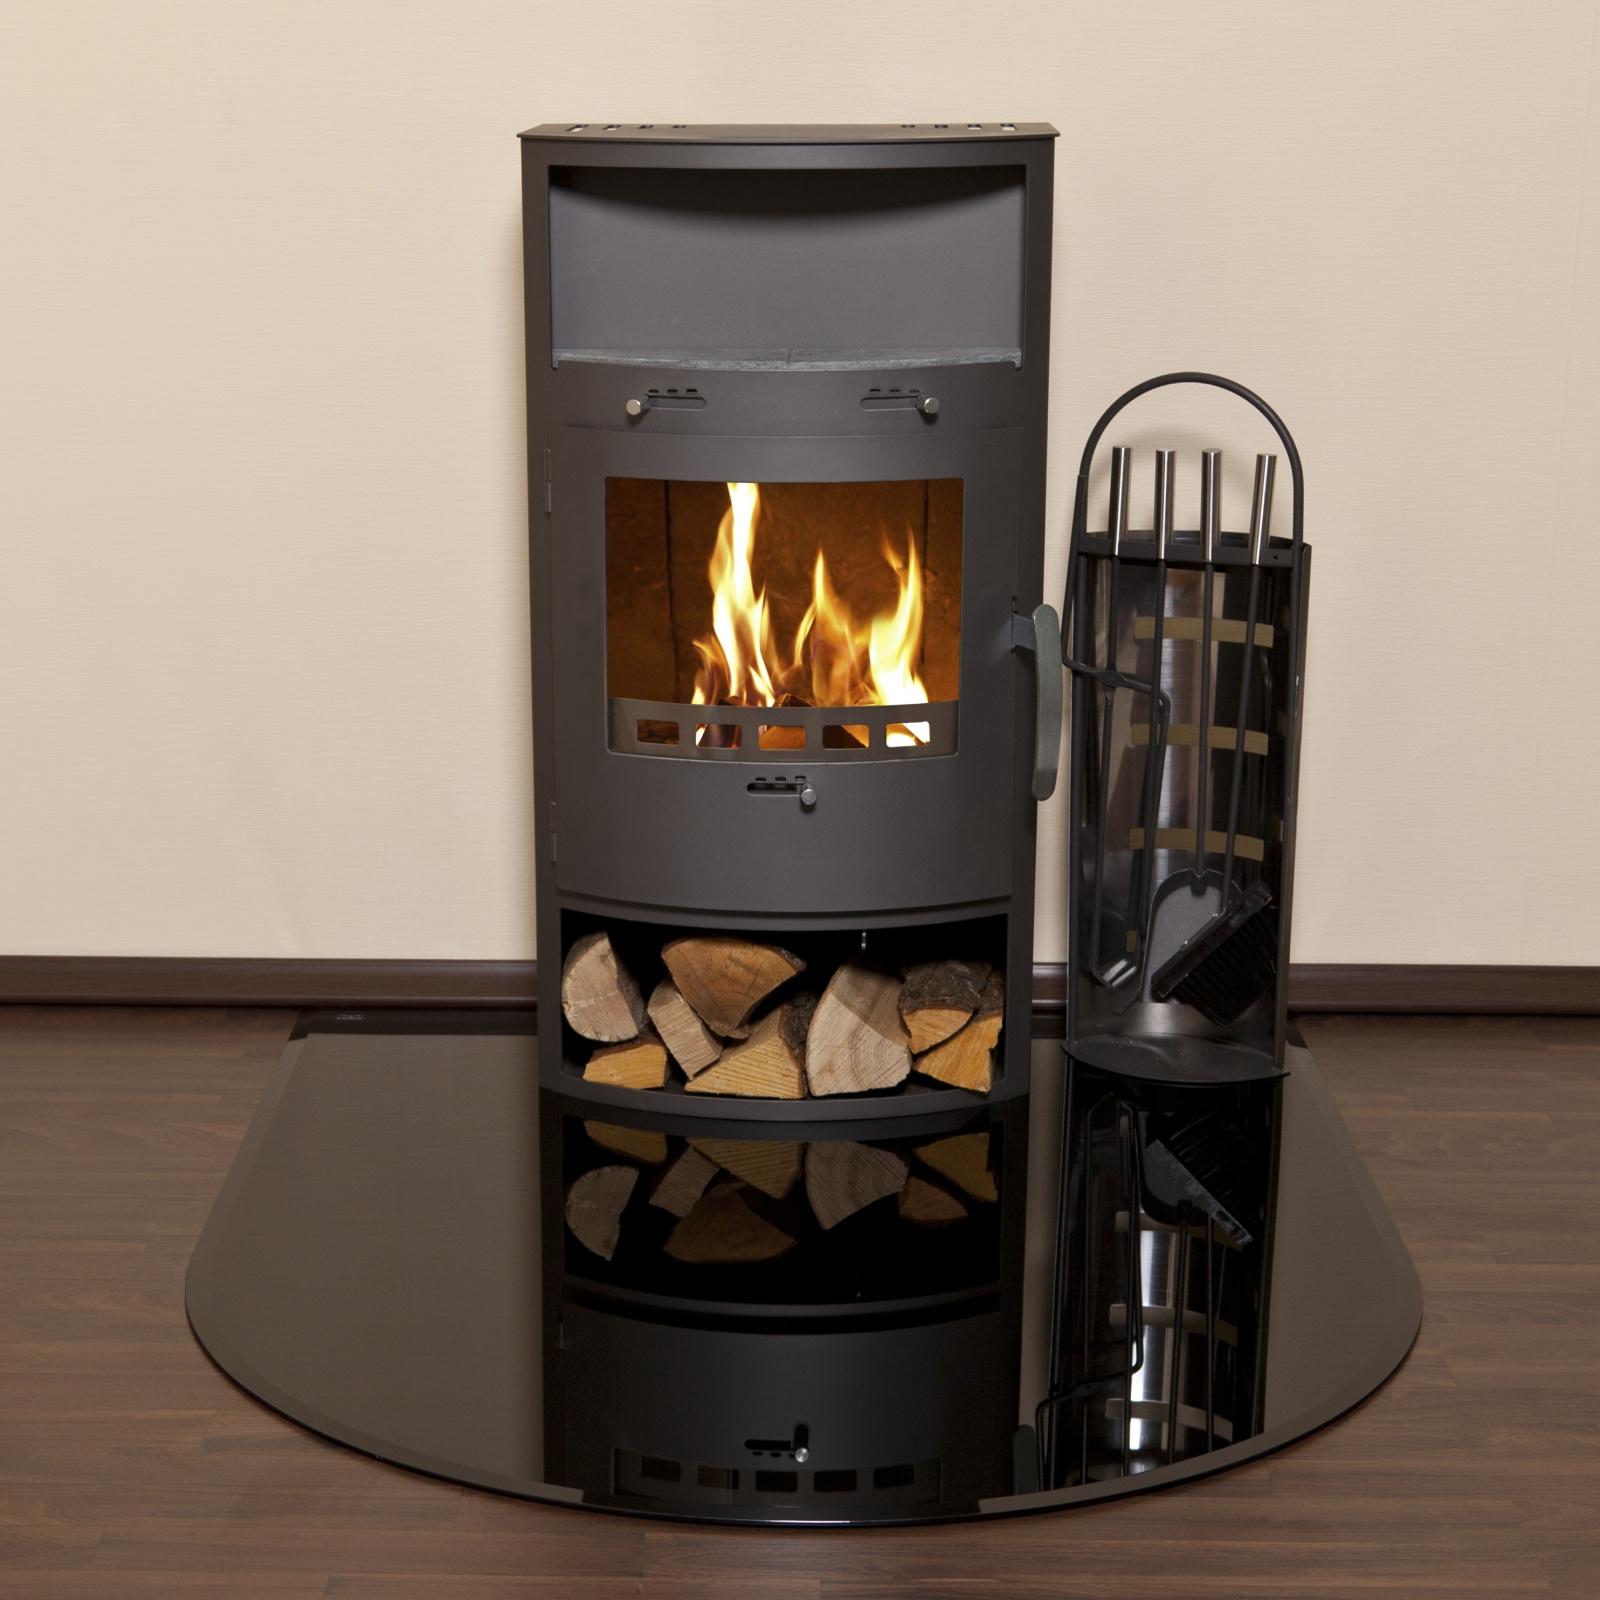 kaminofen bodenglasplatte 6mm funkenschutz mit facette opf 1 1200 schwarz ebay. Black Bedroom Furniture Sets. Home Design Ideas